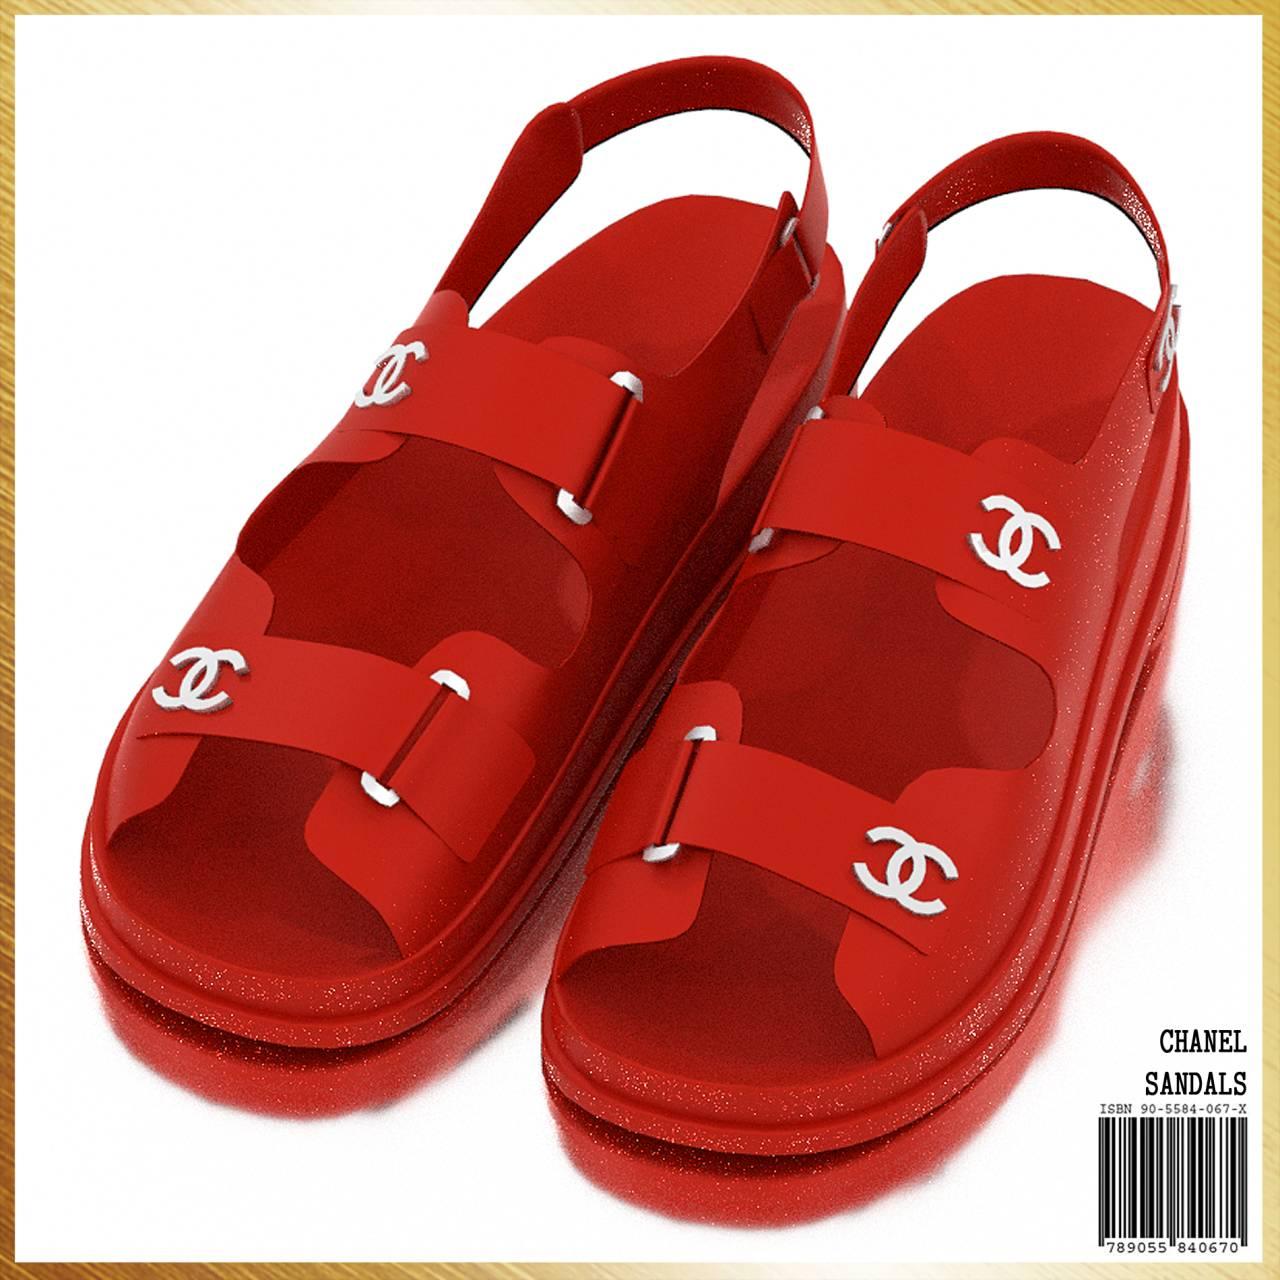 Сандалии - Chanel Sandals